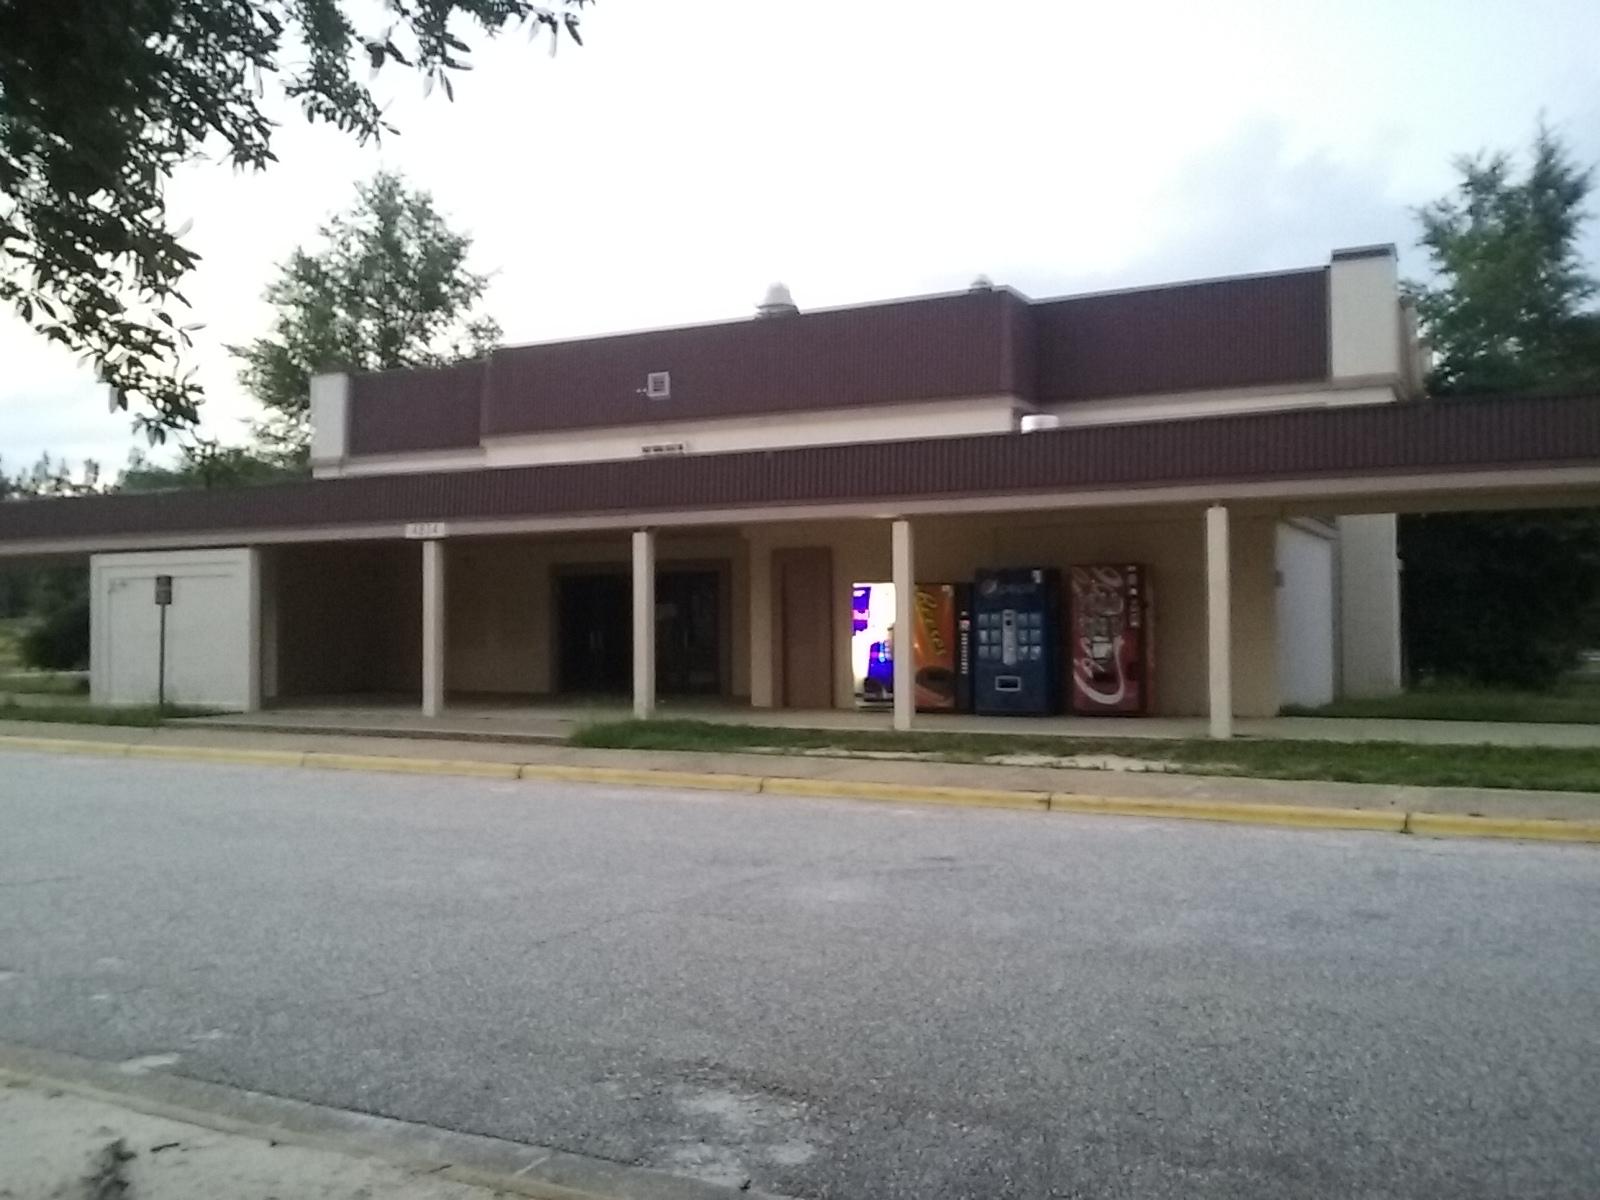 York Theater